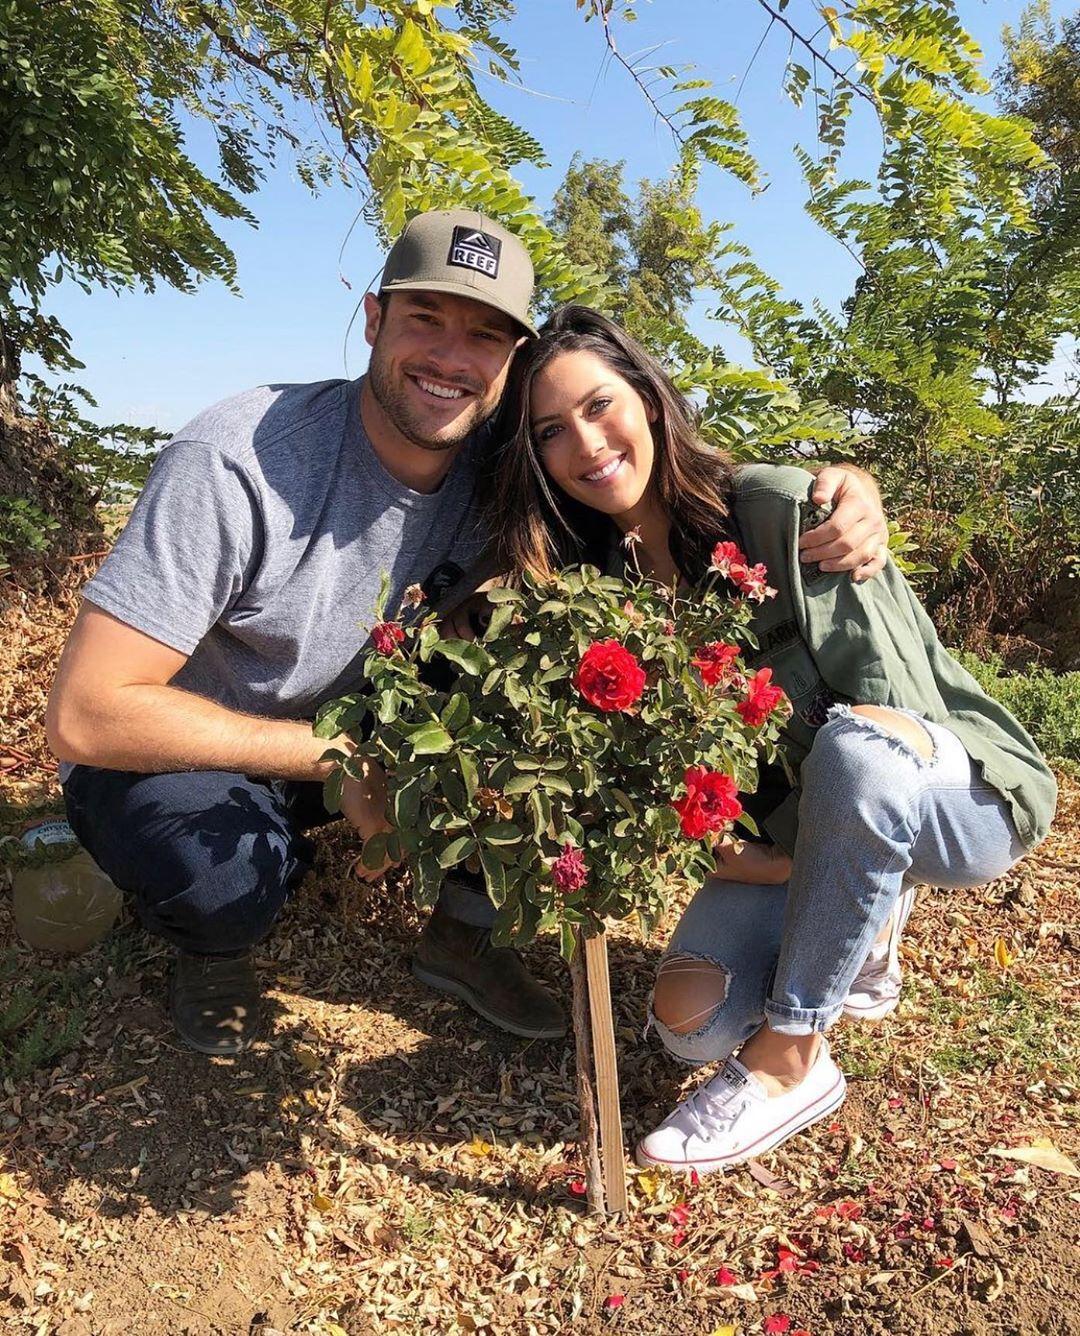 Becca Kufrin and Garrett Yrigoyen Cutest Moments With Rose Bush